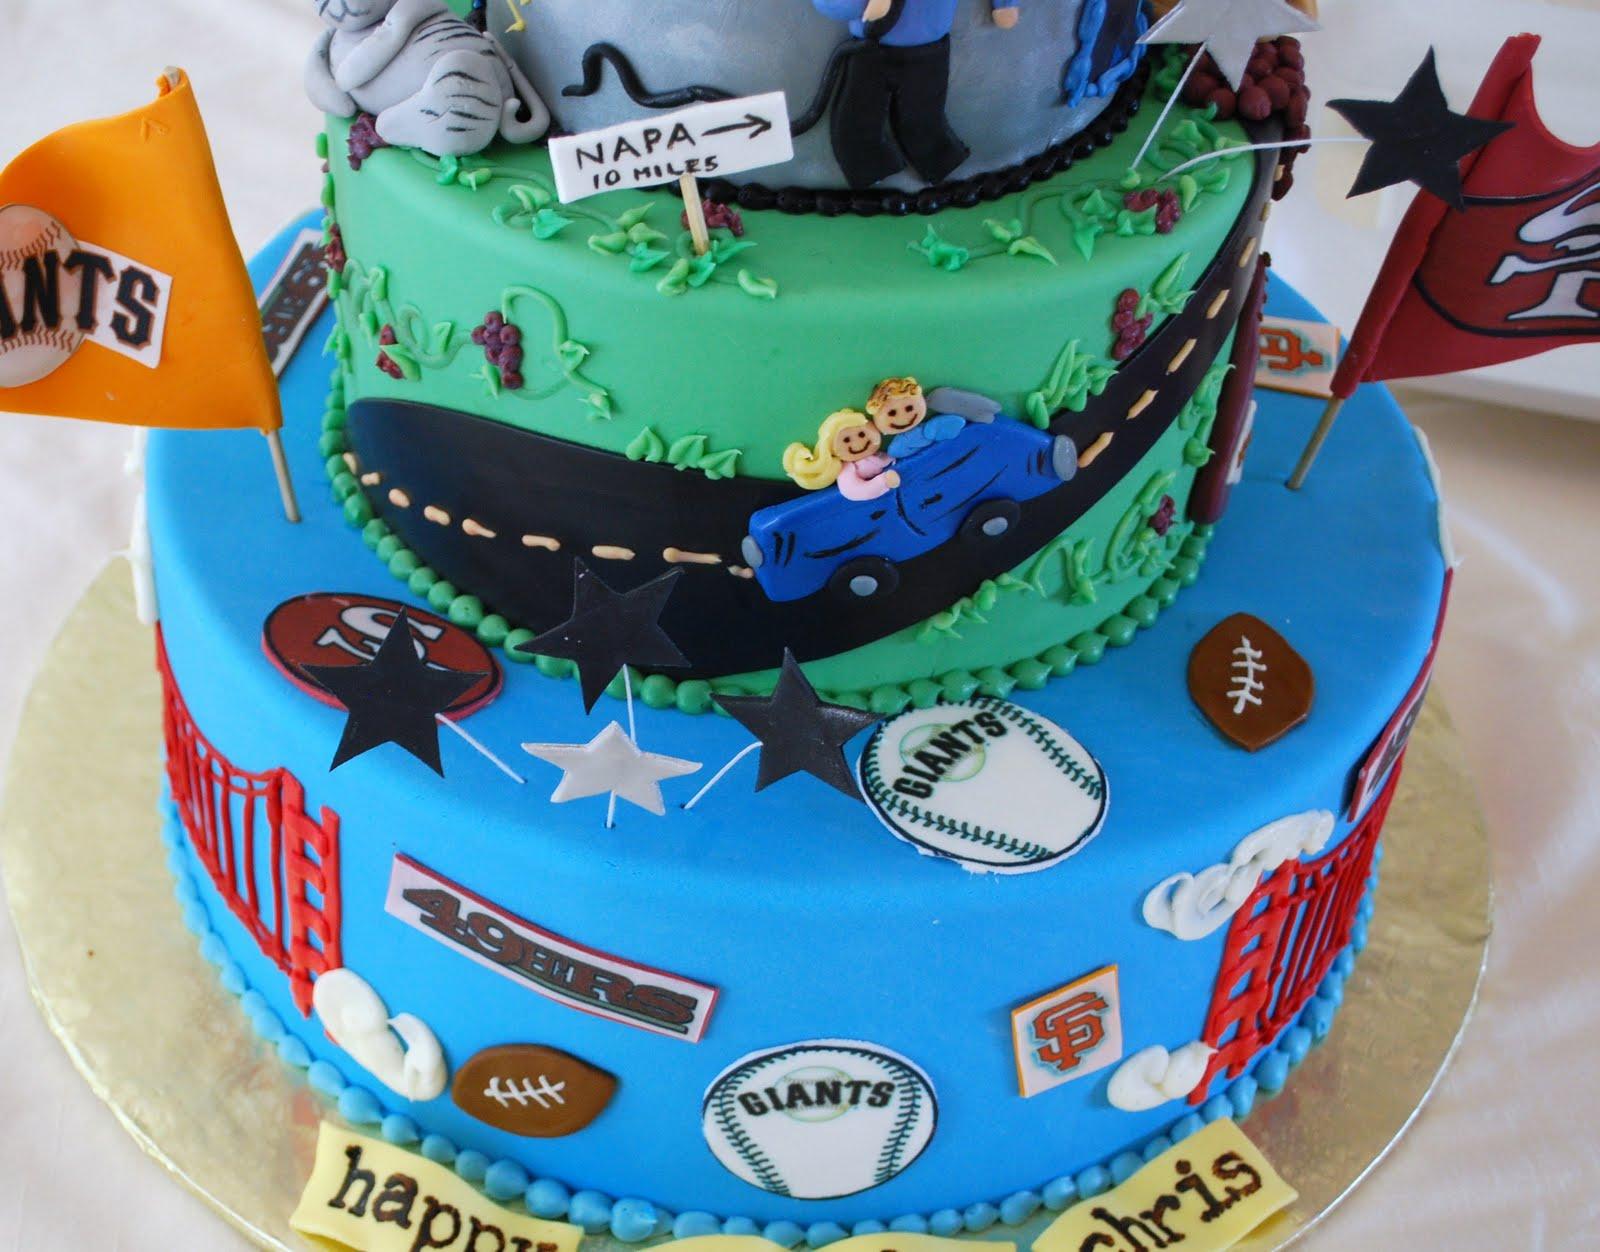 The Beehive 50th Birthday Cake